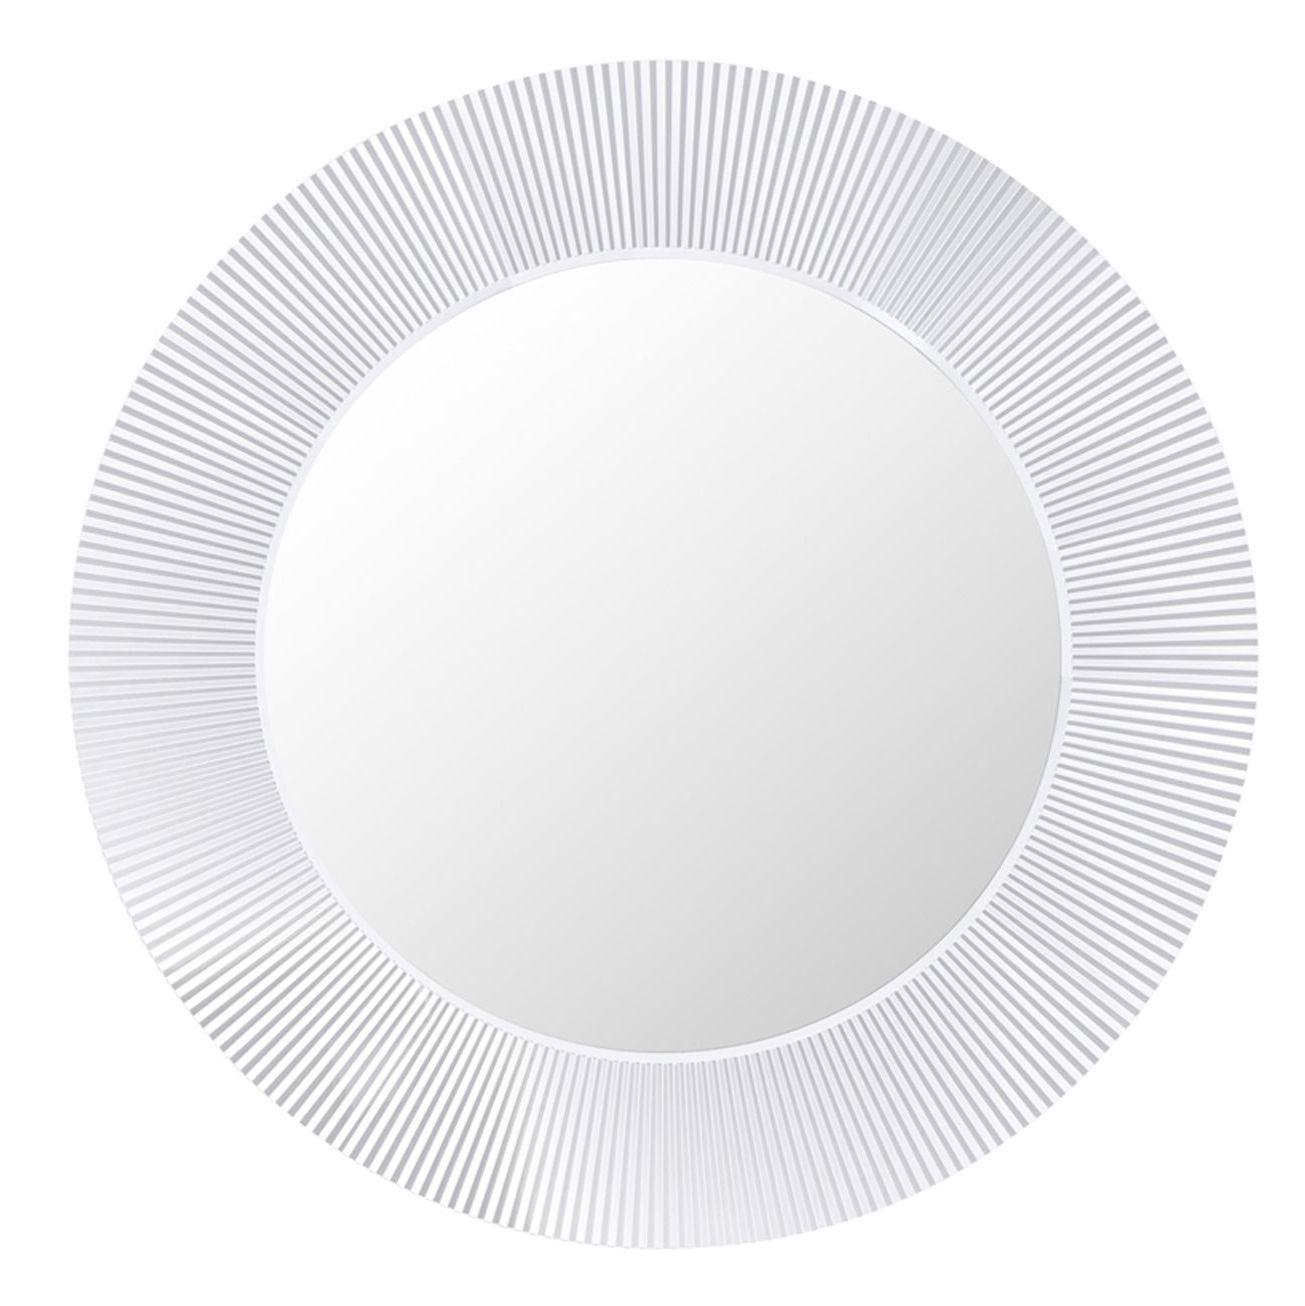 Accessories - Bathroom Accessories - All Saints Illuminated mirror - Luminous  - LED by Kartell - Cristal - Mirror, PMMA